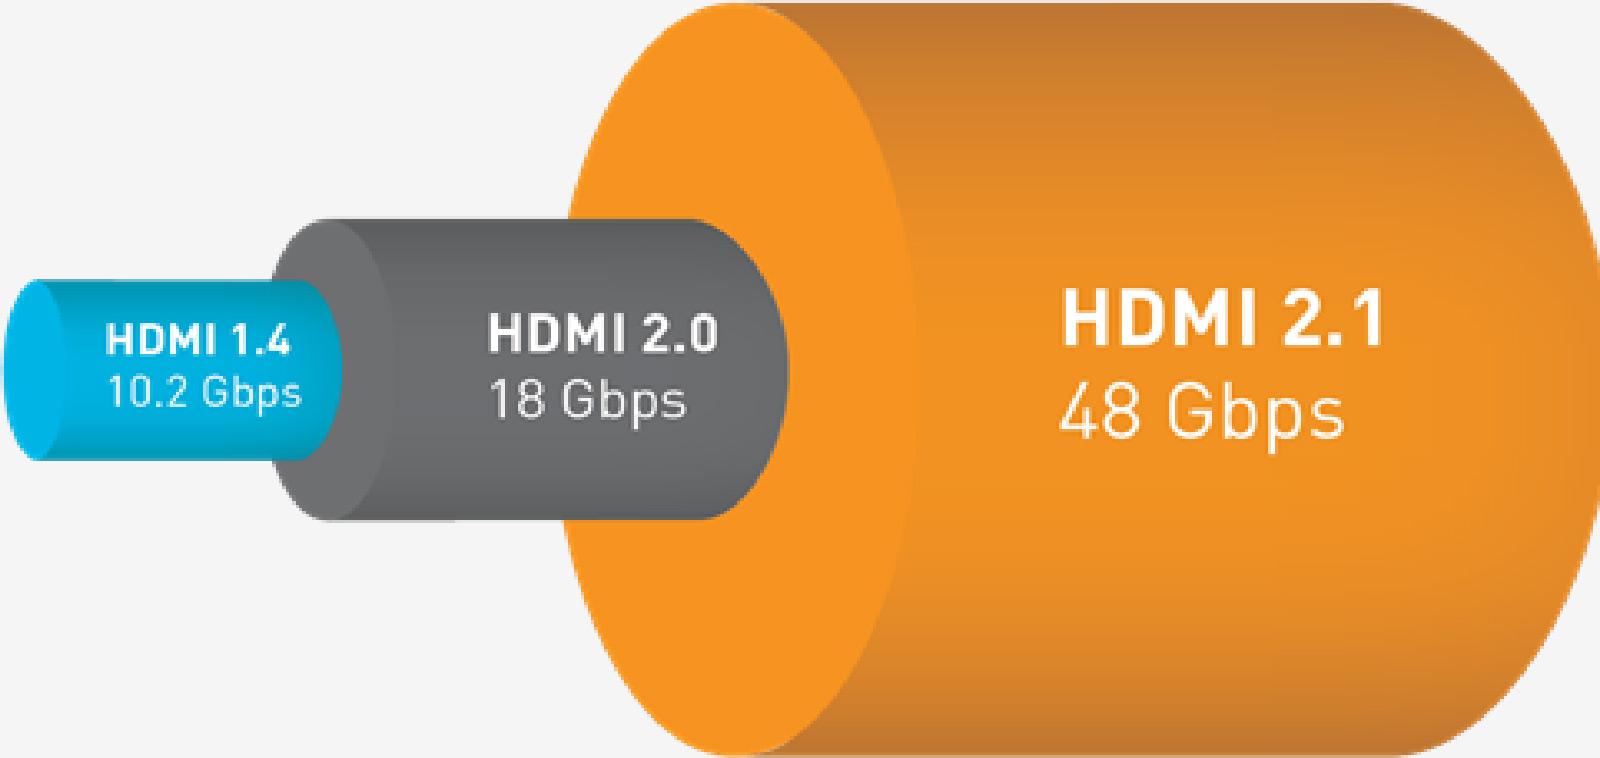 Schéma vulgarisant les différents débits des principales normes HDMI (Source: HDMI Forum).